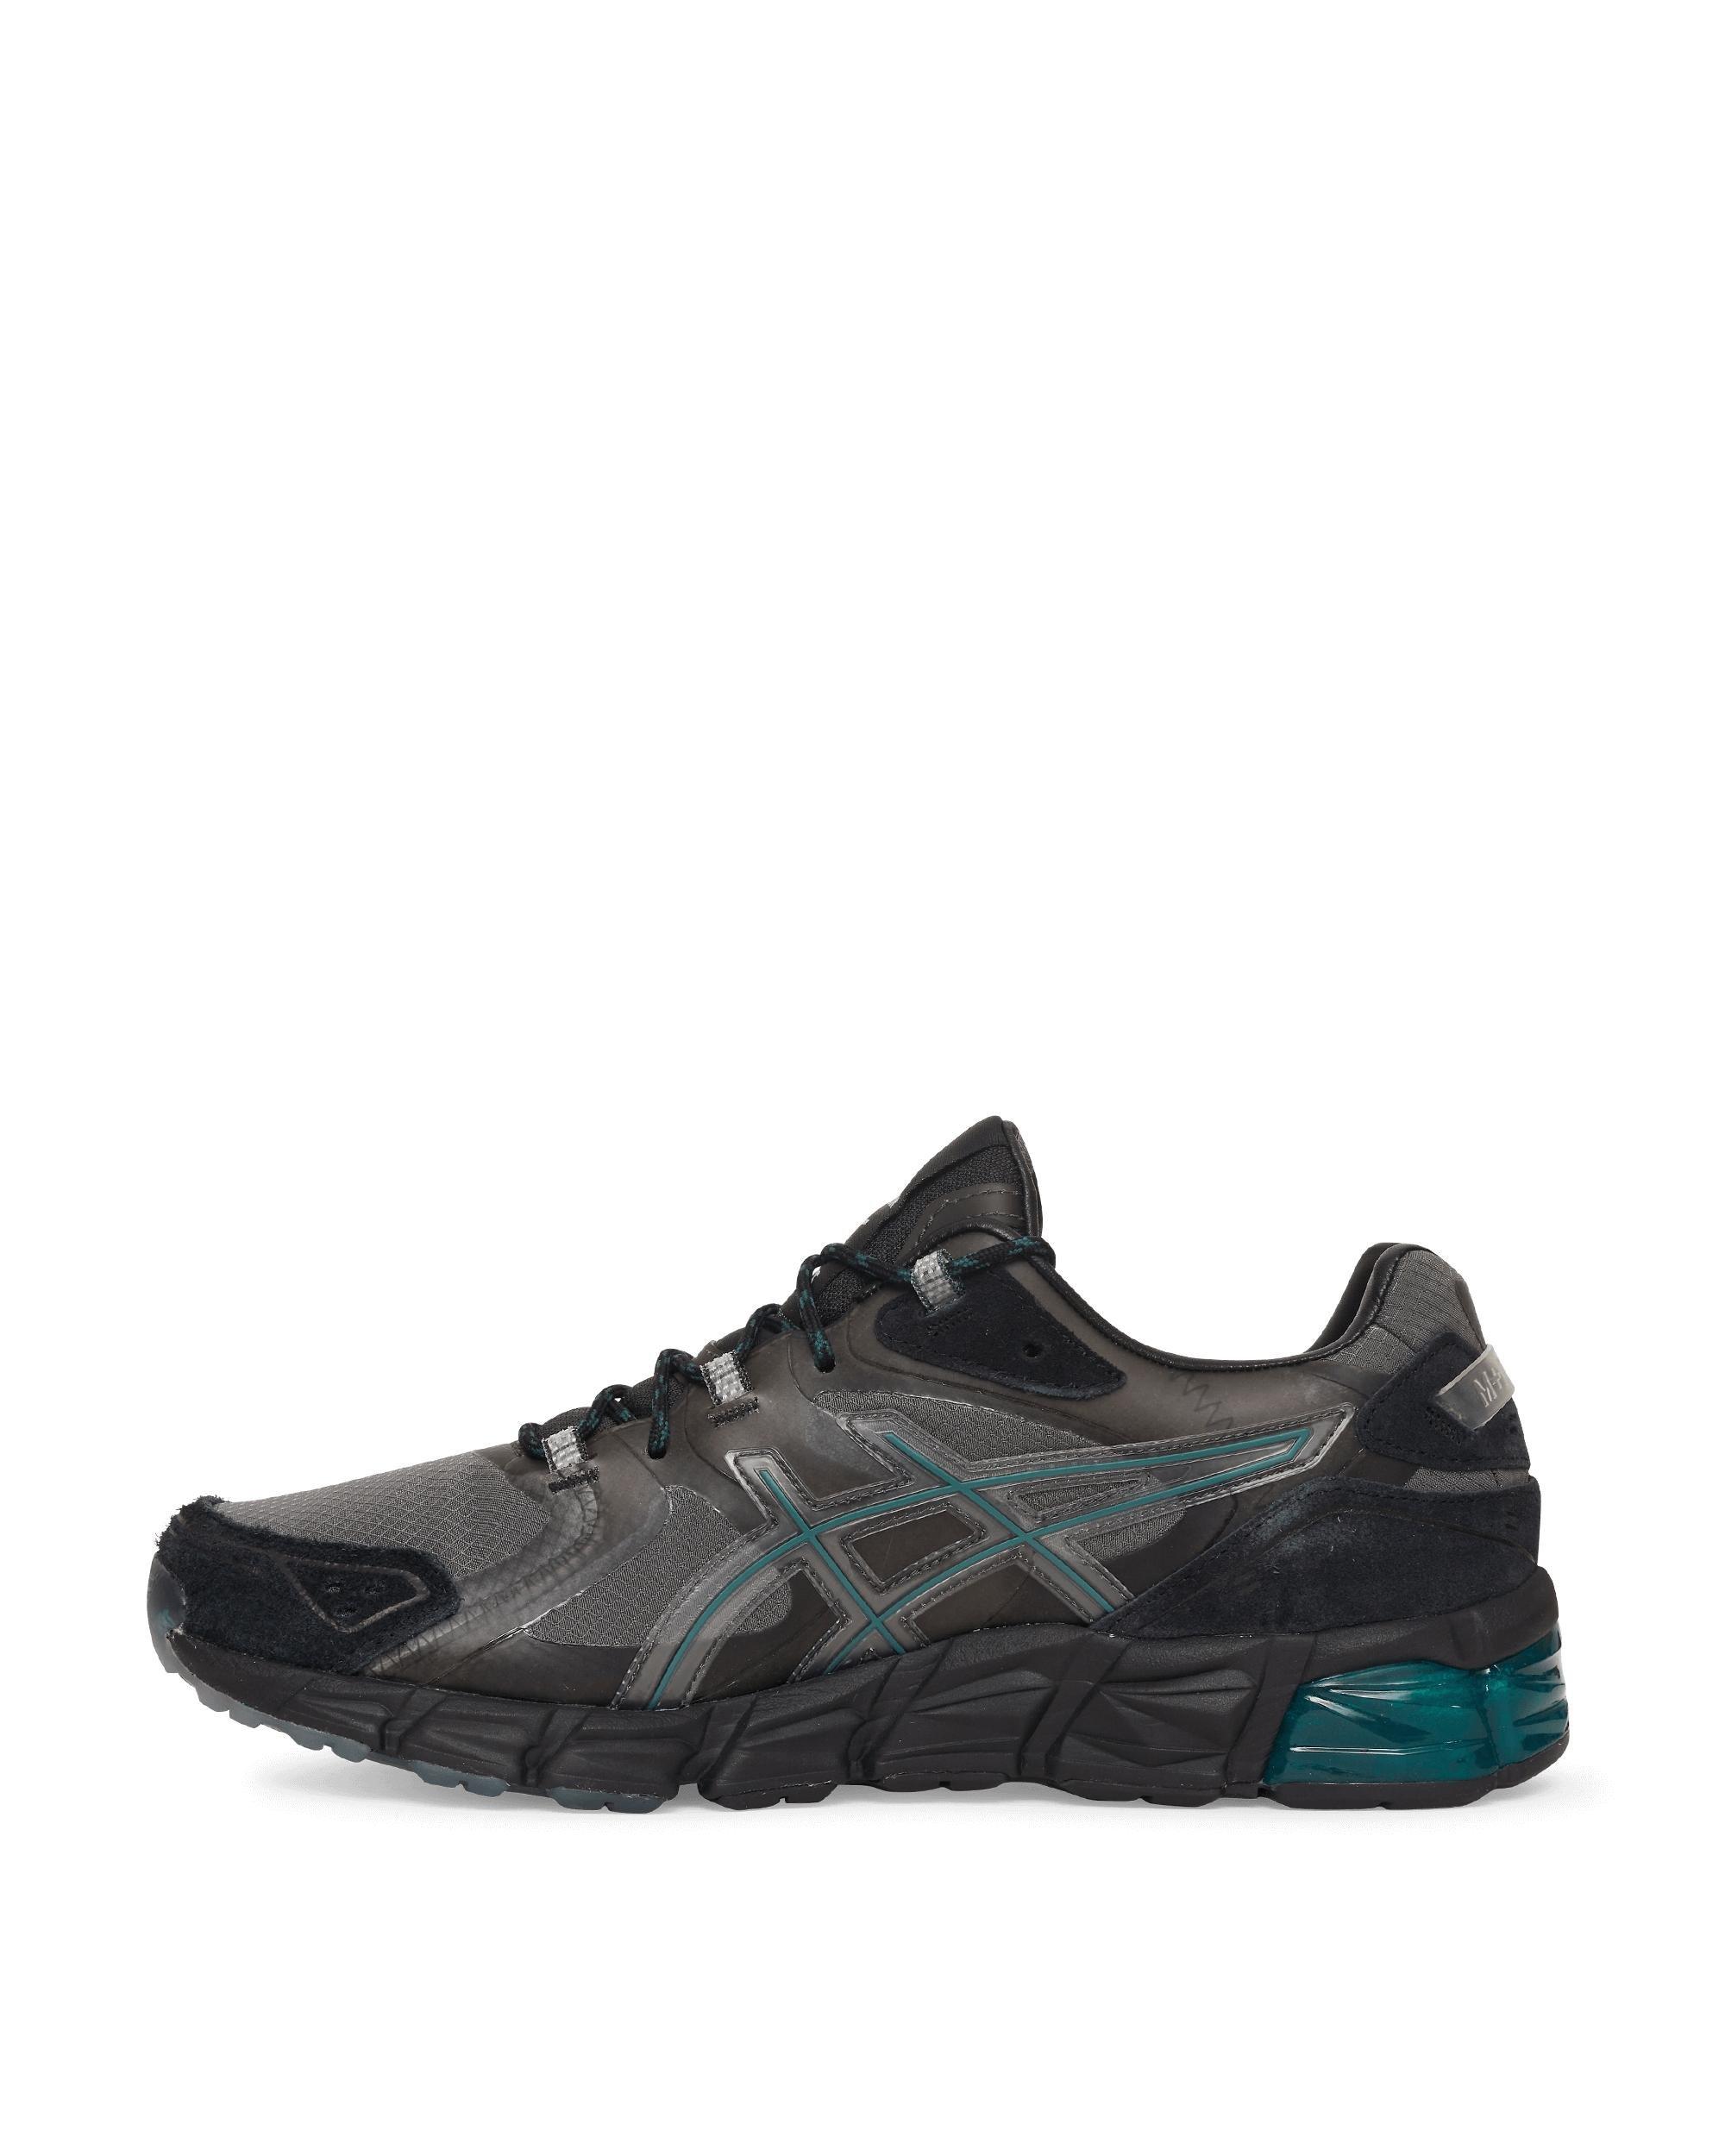 Asics Synthetic M rc Noir Gel Quantum 180 Sneakers Graphite Grey ...